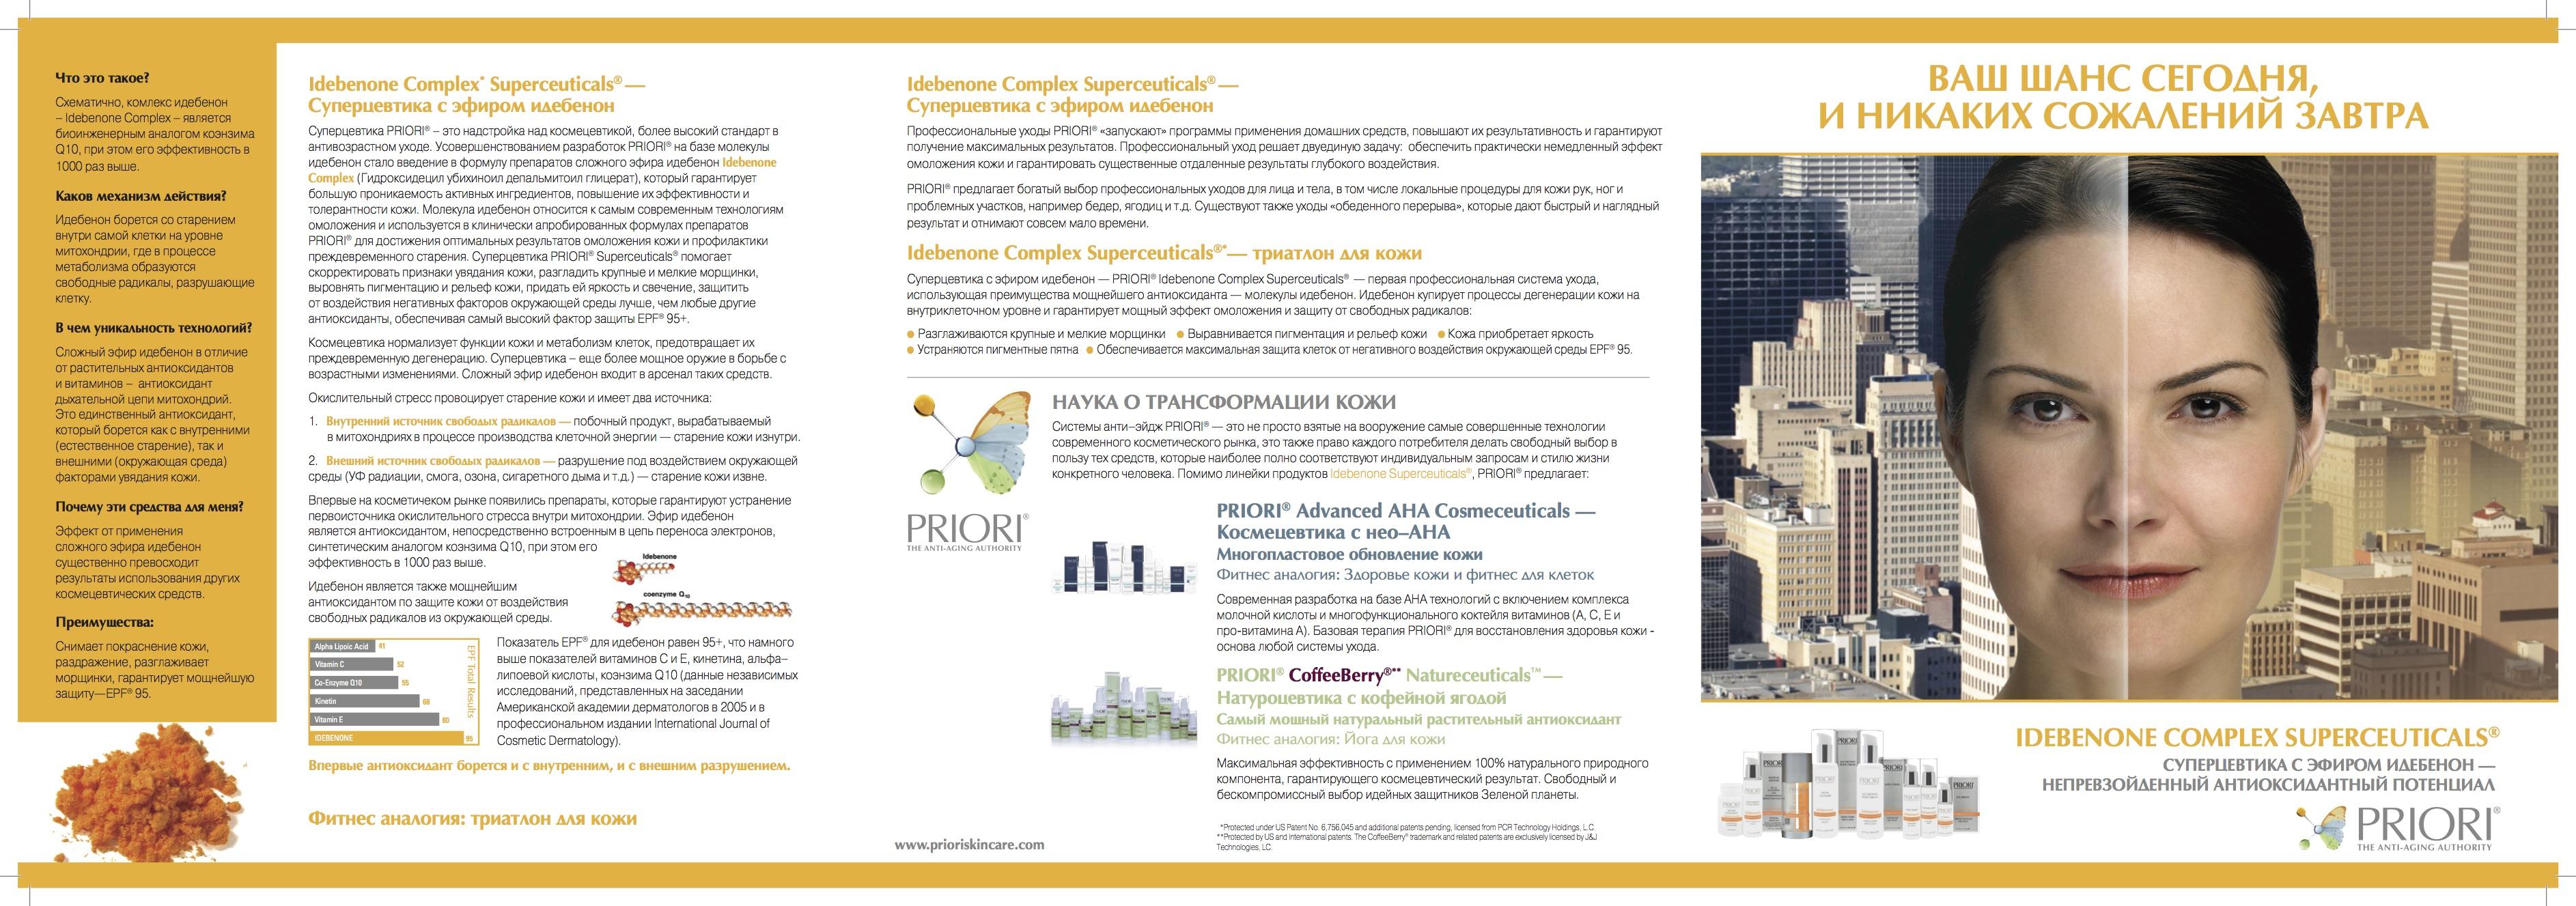 Rus_Idebenone_Complex_Consumer_Brochure.jpg